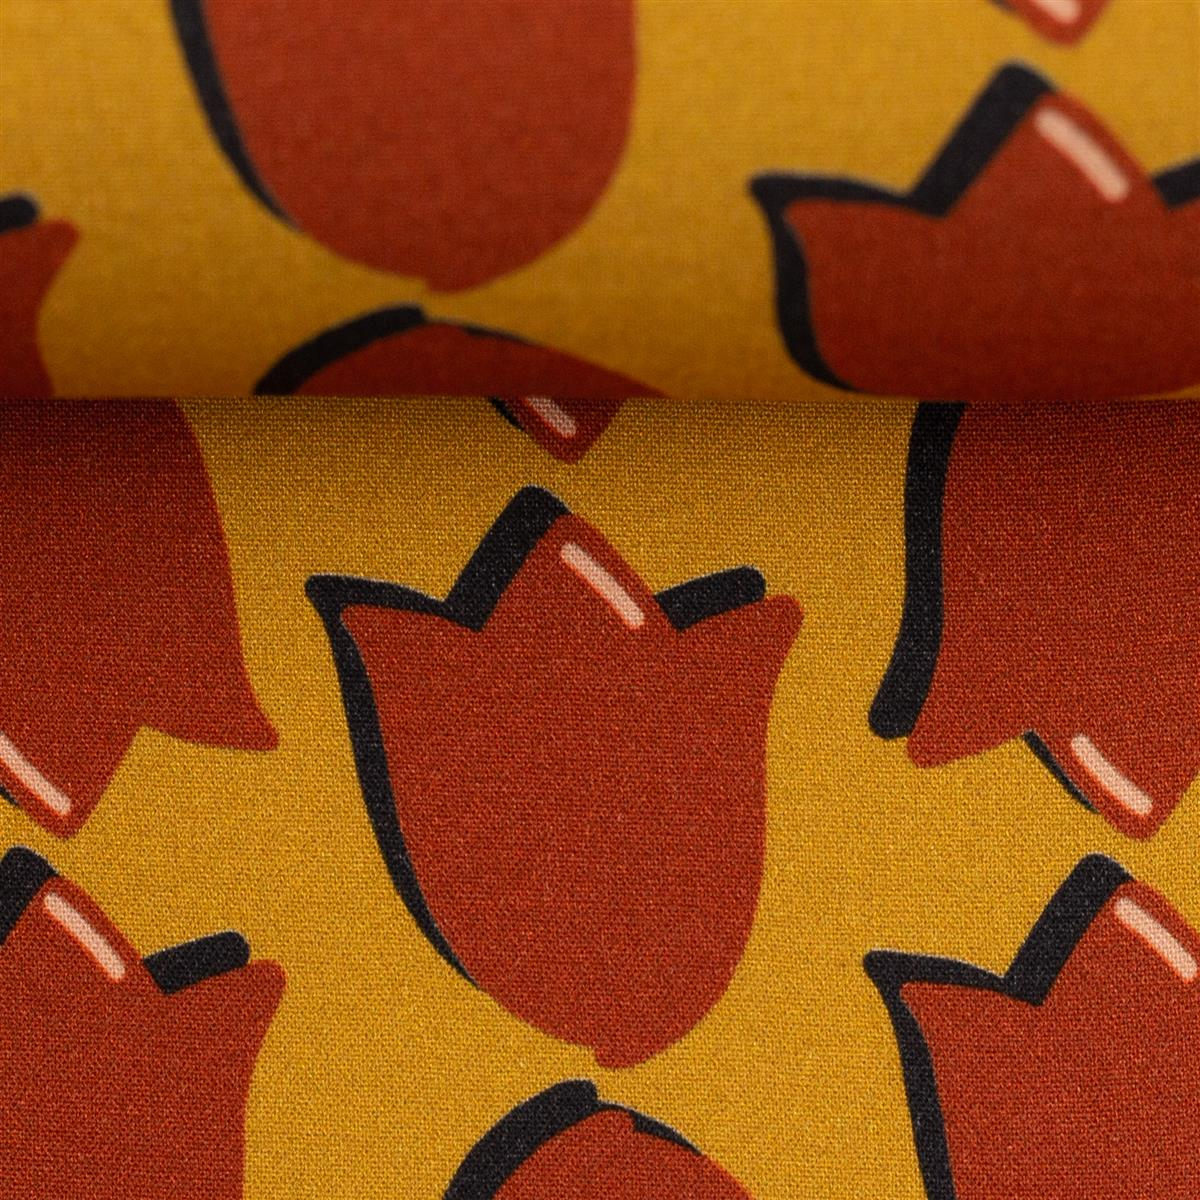 081349-100314-retro-tulips-cherry-picking-ballen